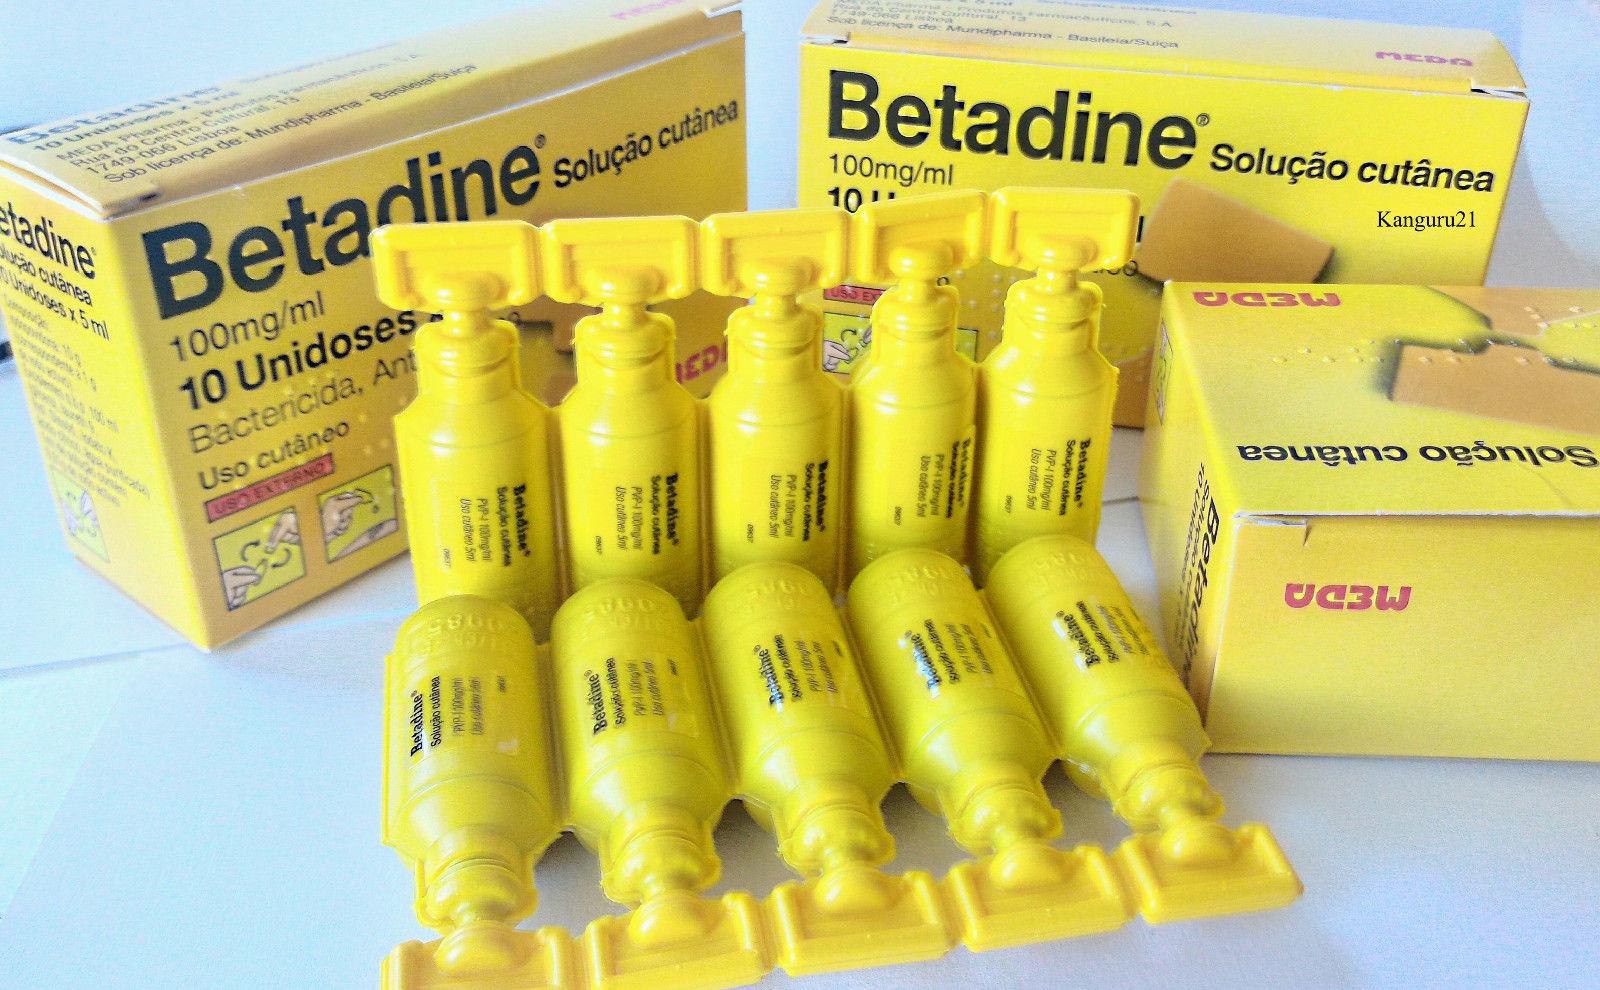 Pods Betadine 5ml Cc First Aid Skin Cleanser Antiseptic Solution 5 Ml 295 Povidone Iodine Ebay